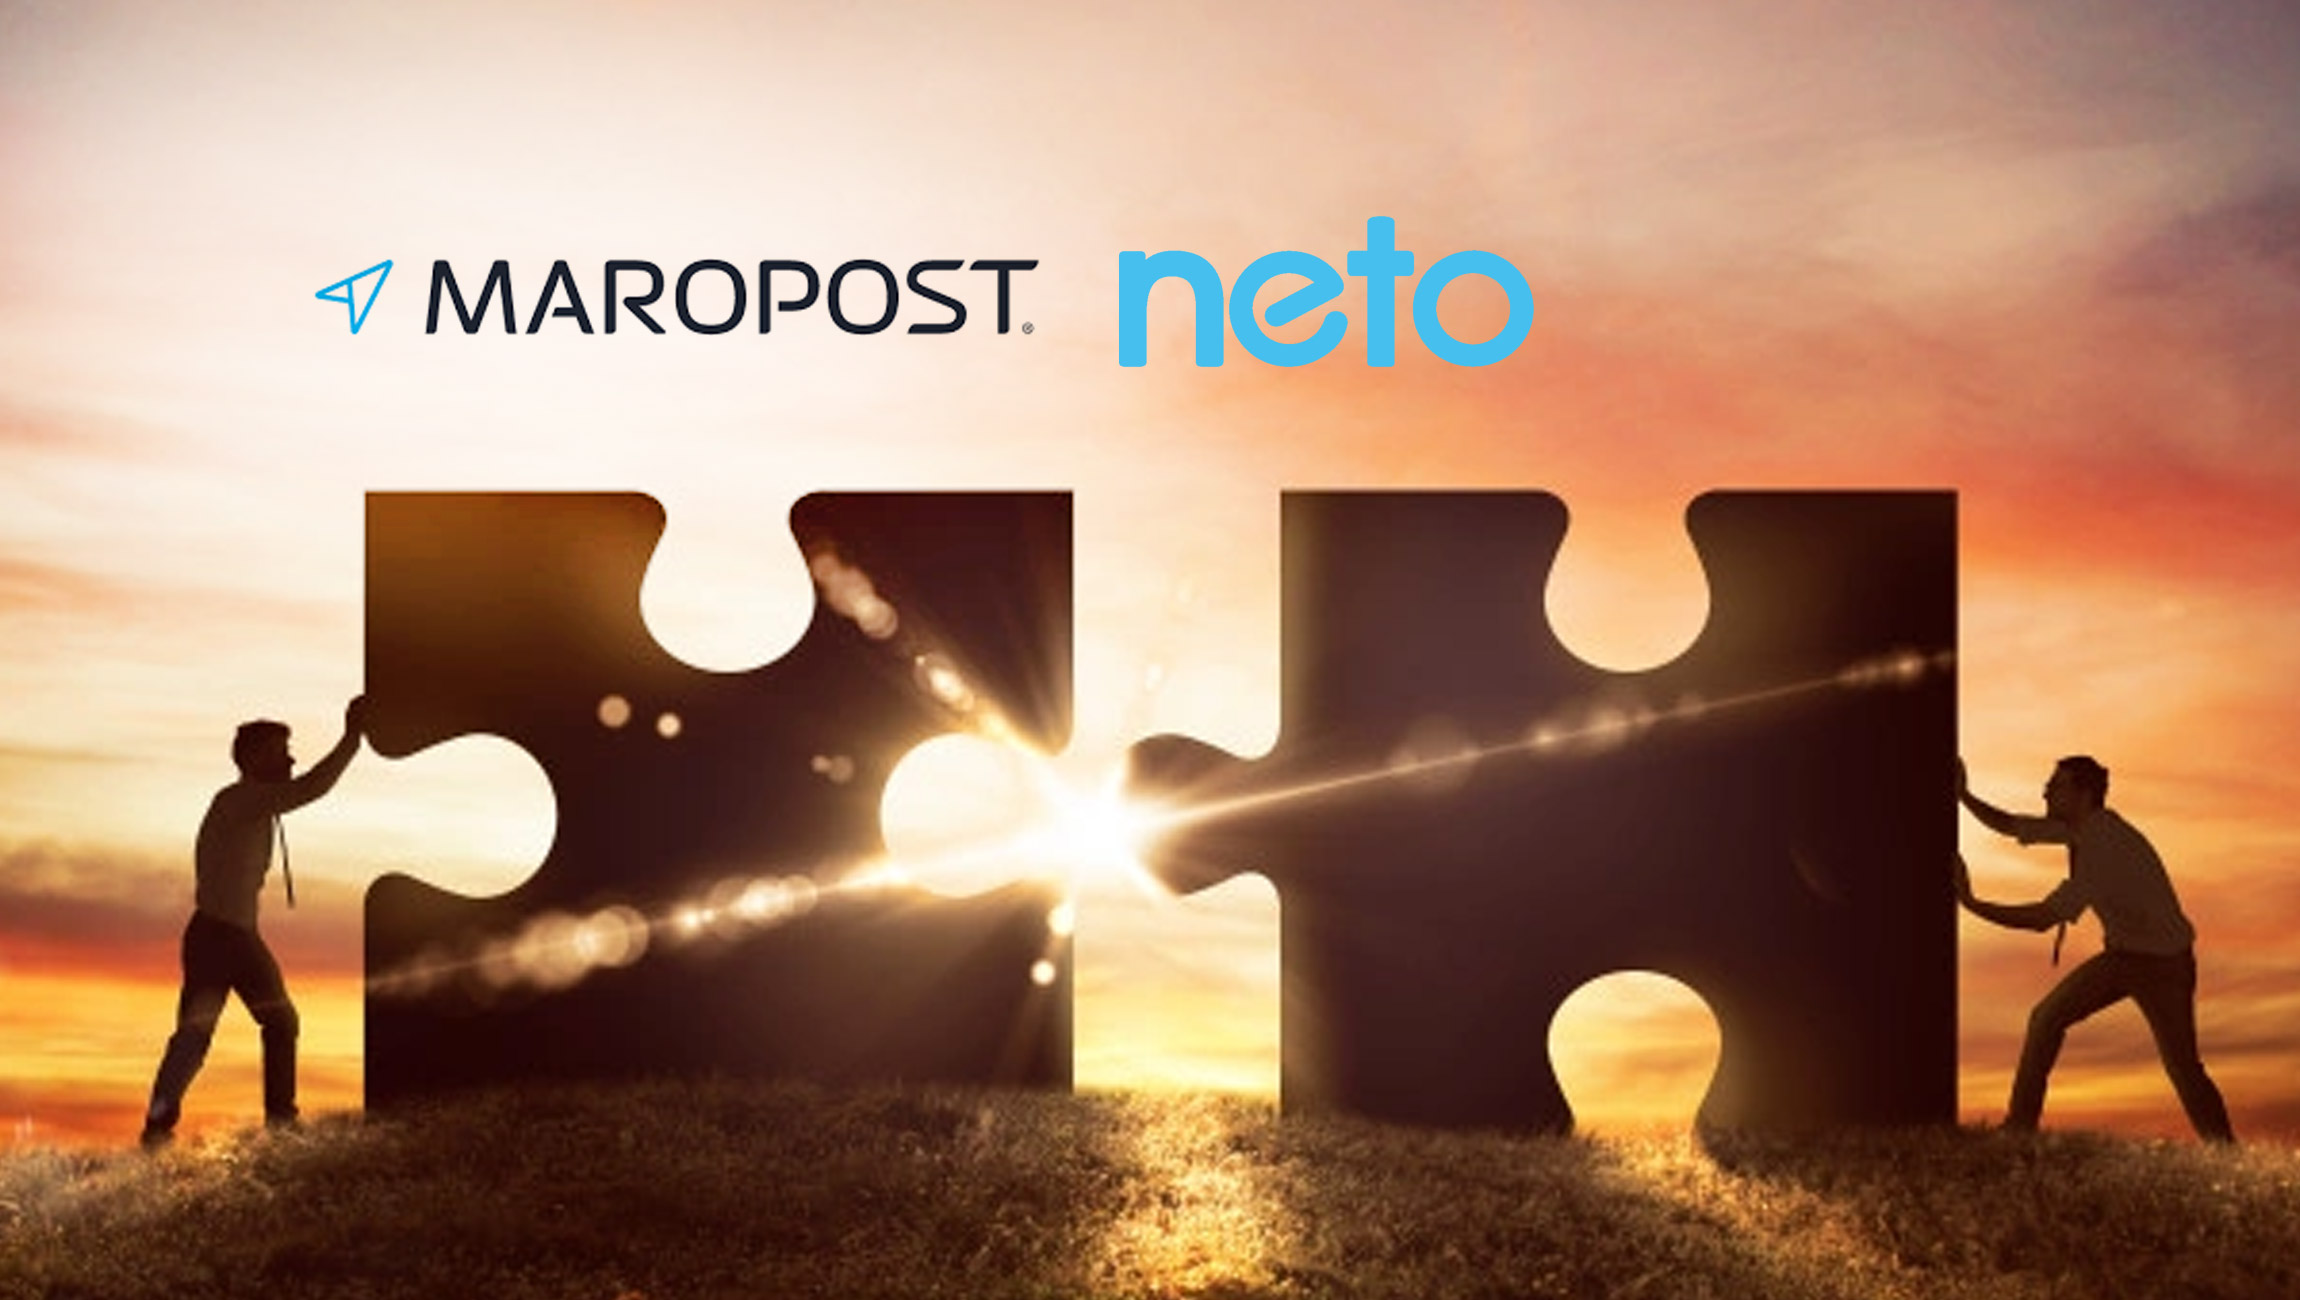 Martech Leader Maropost Acquires E-Commerce Platform Neto for $60M + Considerations